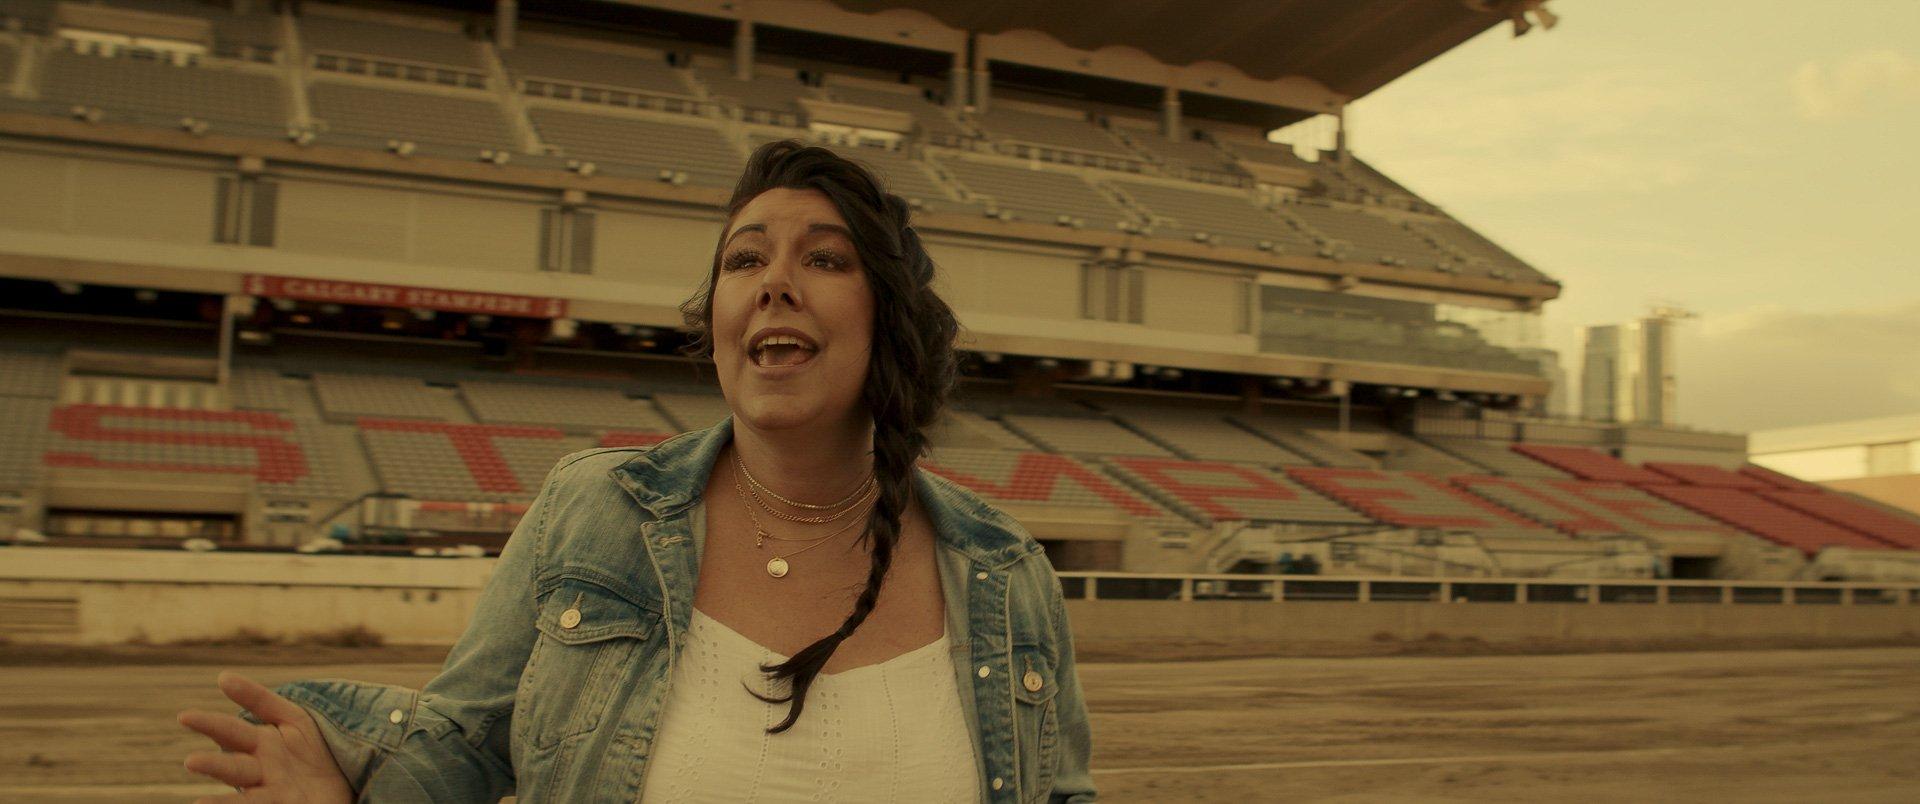 Sweet City Woman Revv52 MEDIAPOP Films